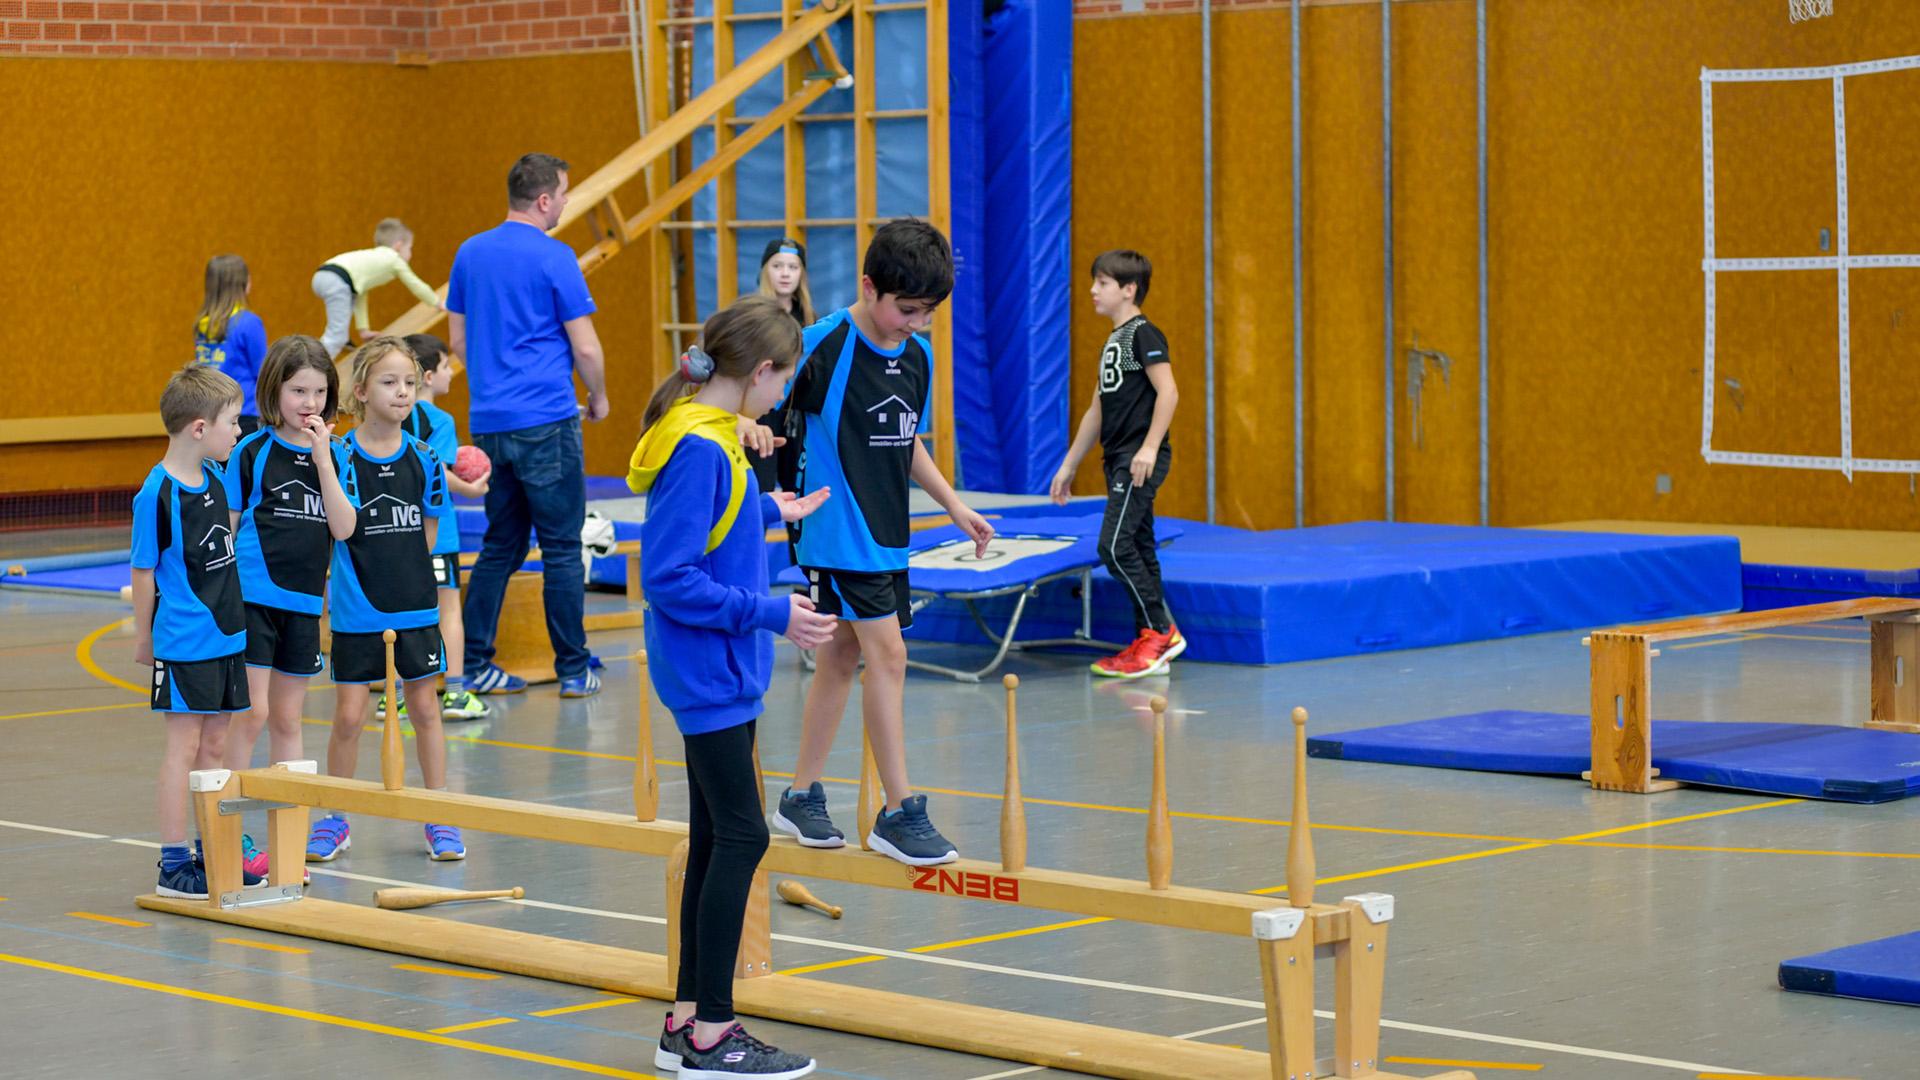 035Slider_gF_tsg_leutkirch_handball